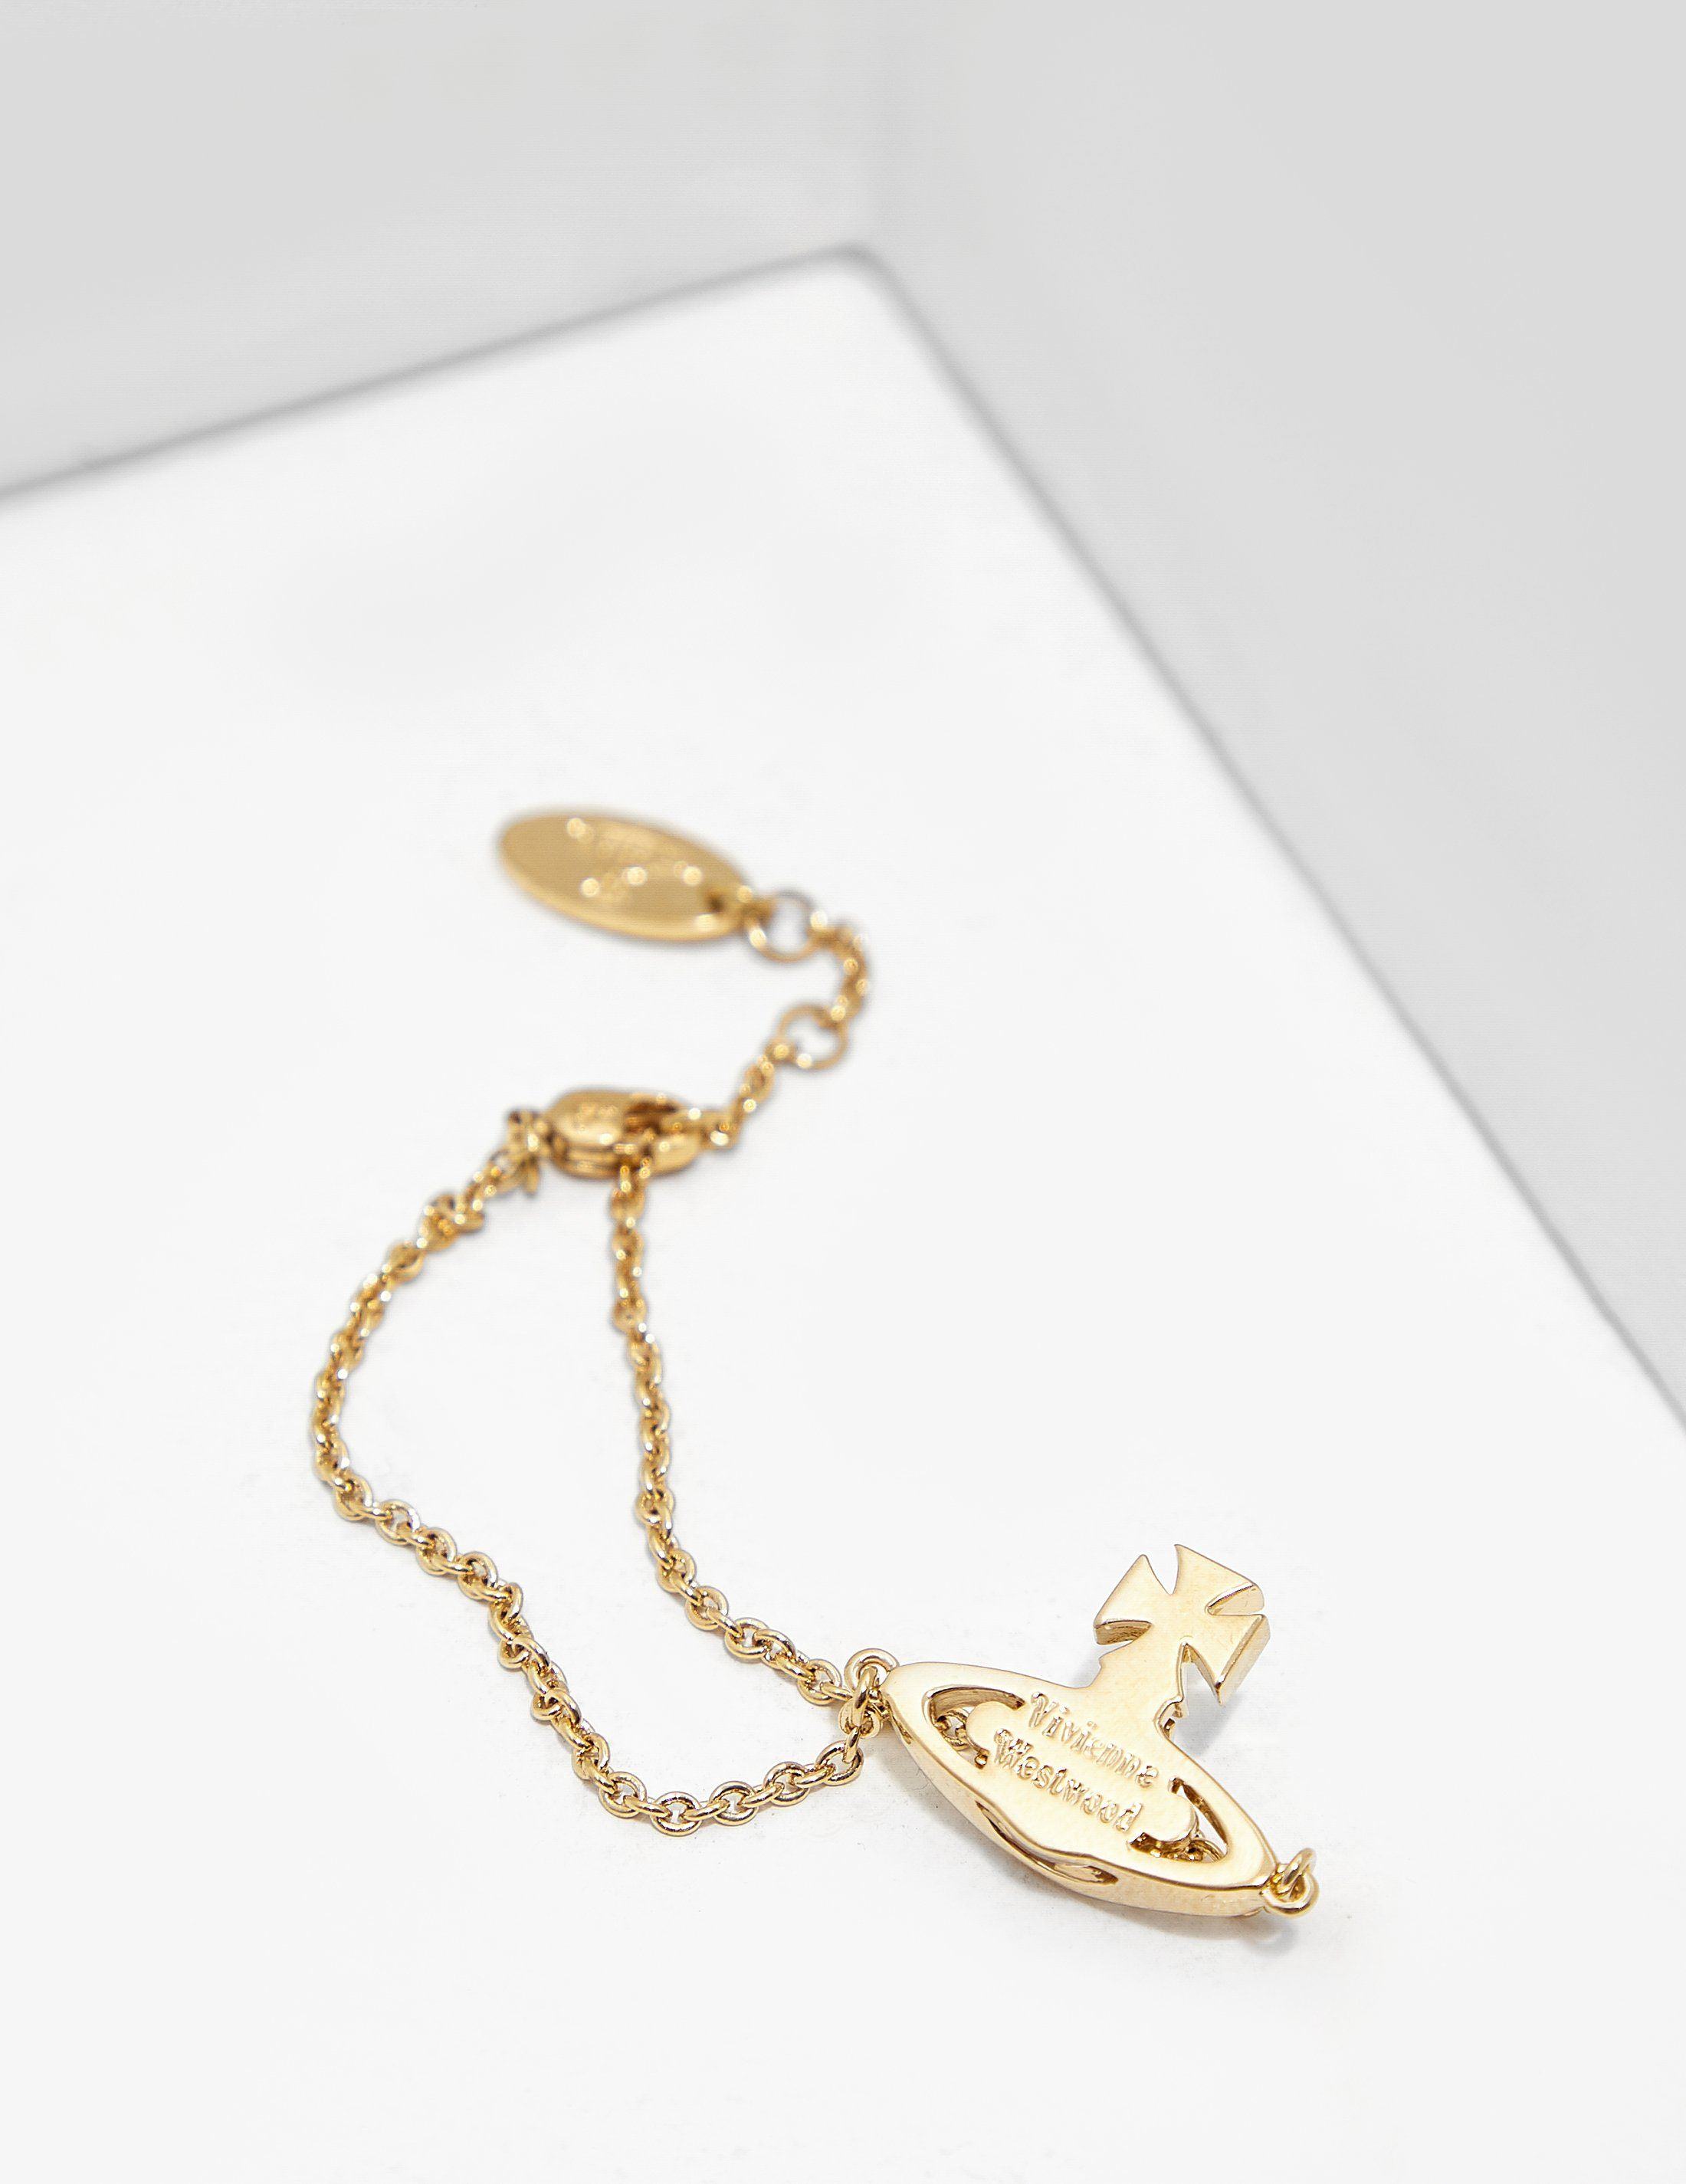 Vivienne Westwood Sorada Bracelet